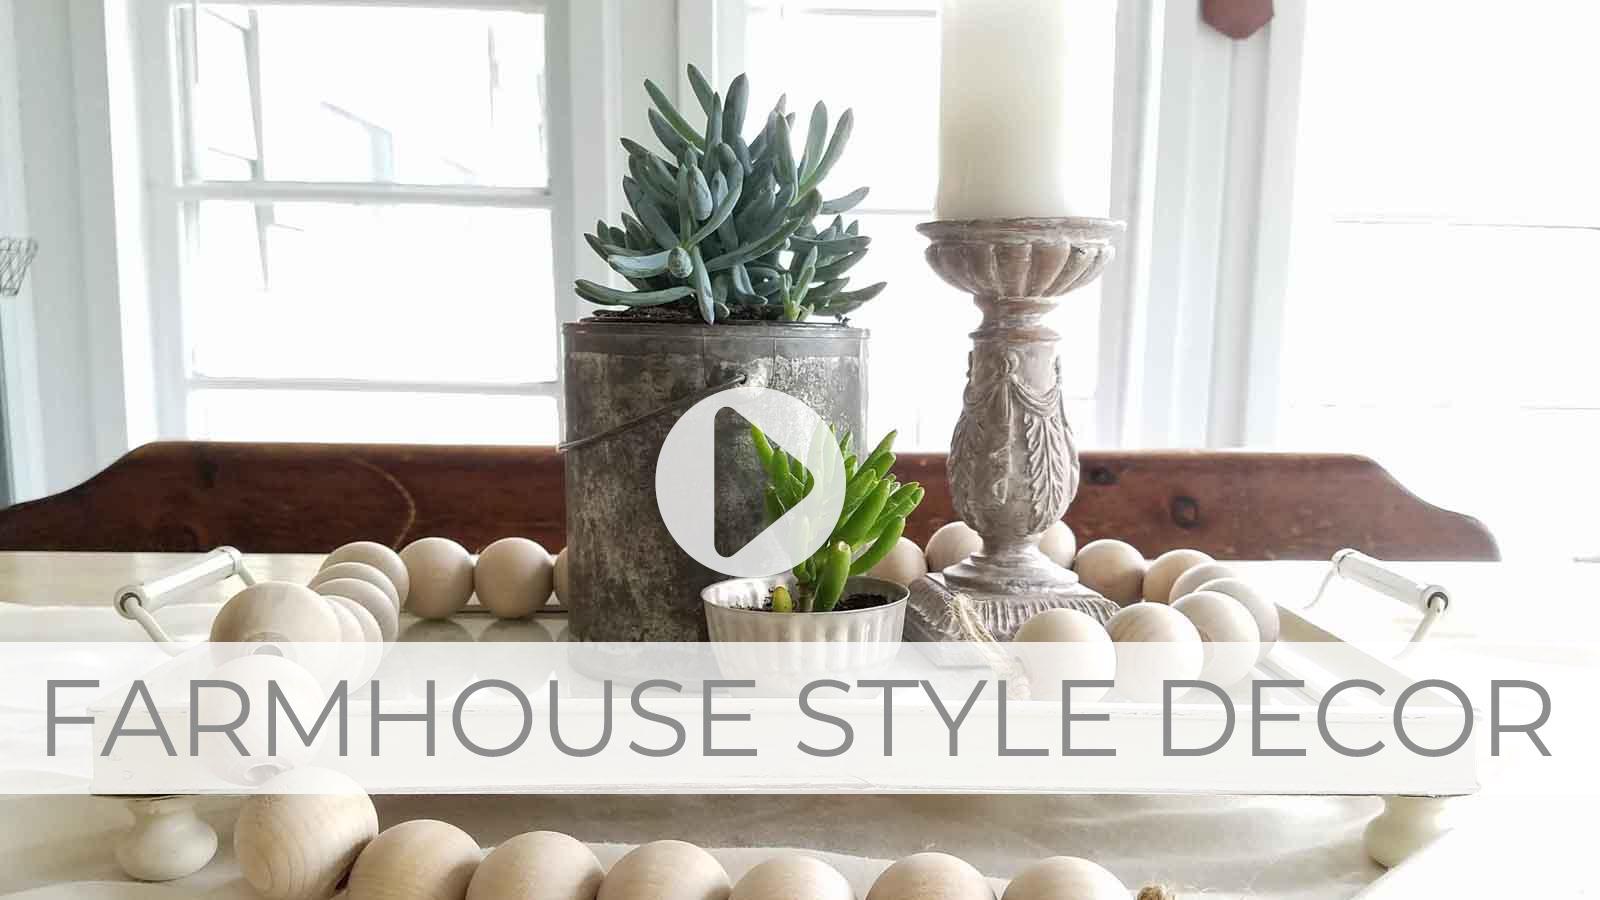 Farmhouse Style Decor Video Tutorial by Larissa of Prodigal Pieces | prodigalpieces.com